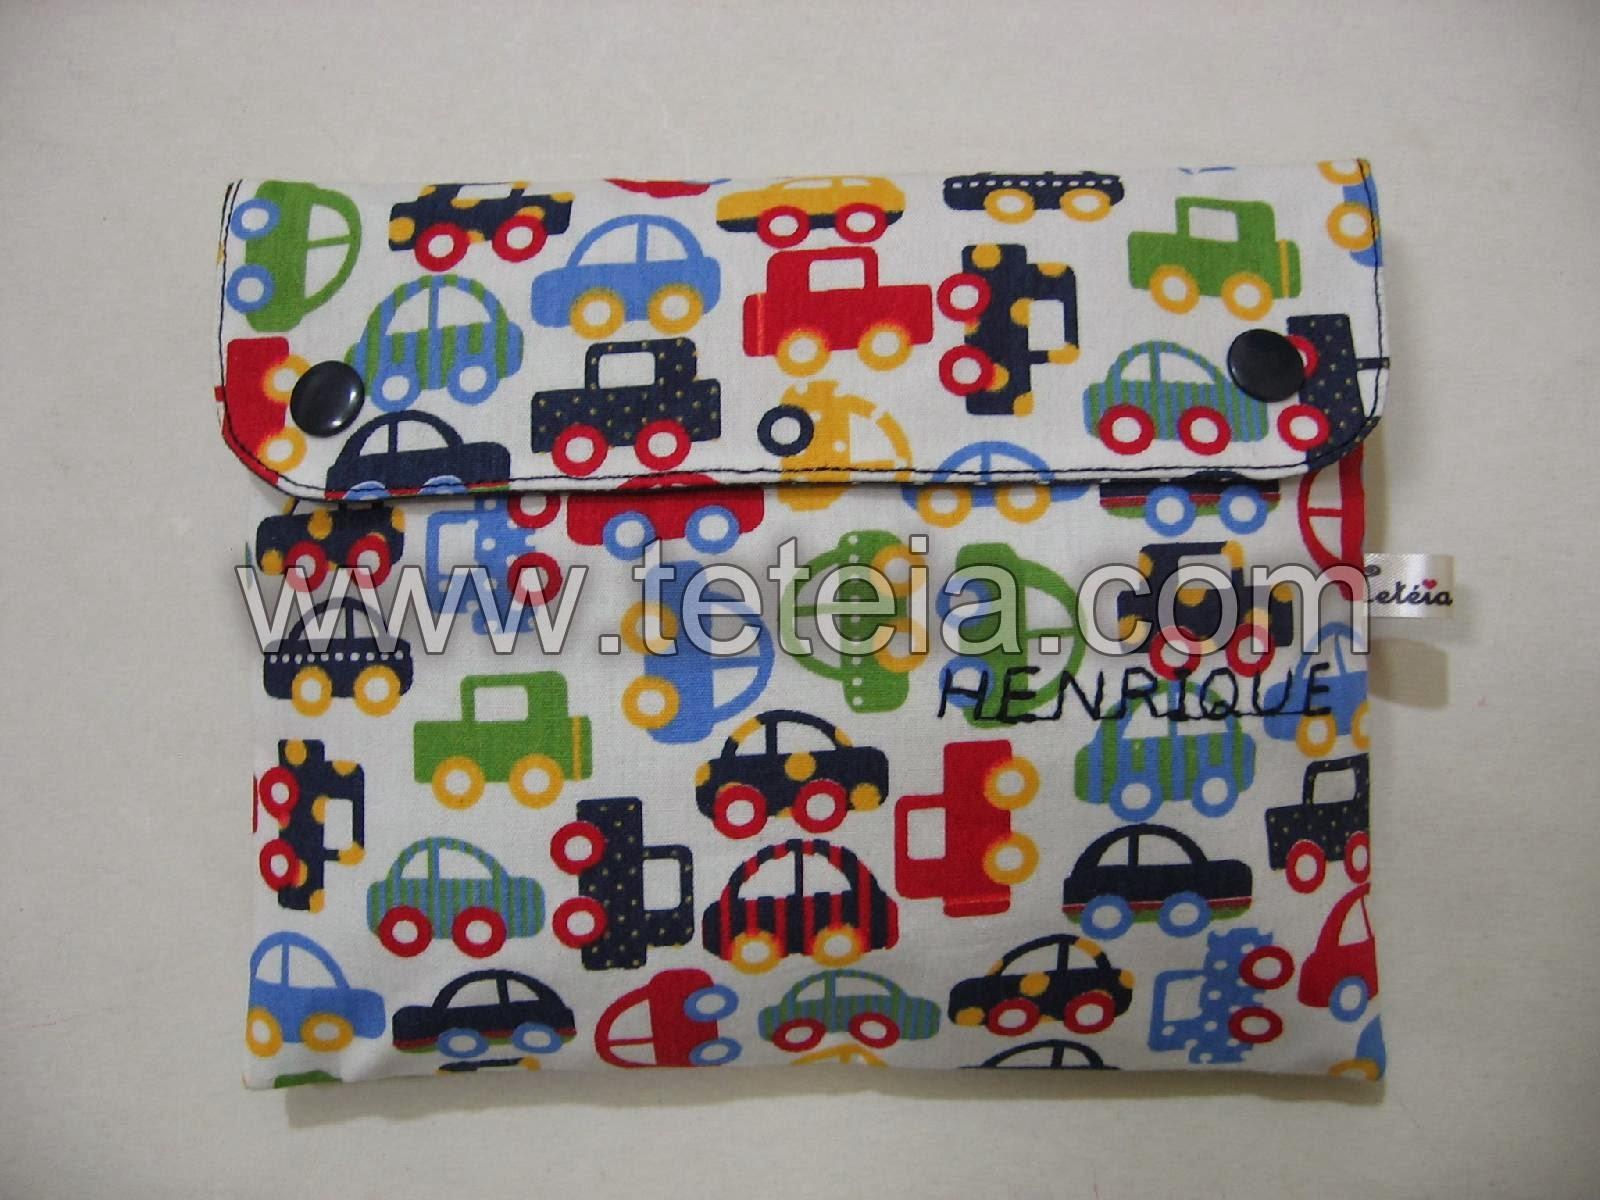 Tetéia Patchwork: Kit de higiene bucal infantil carrinhos/marinho  #831C23 1600x1200